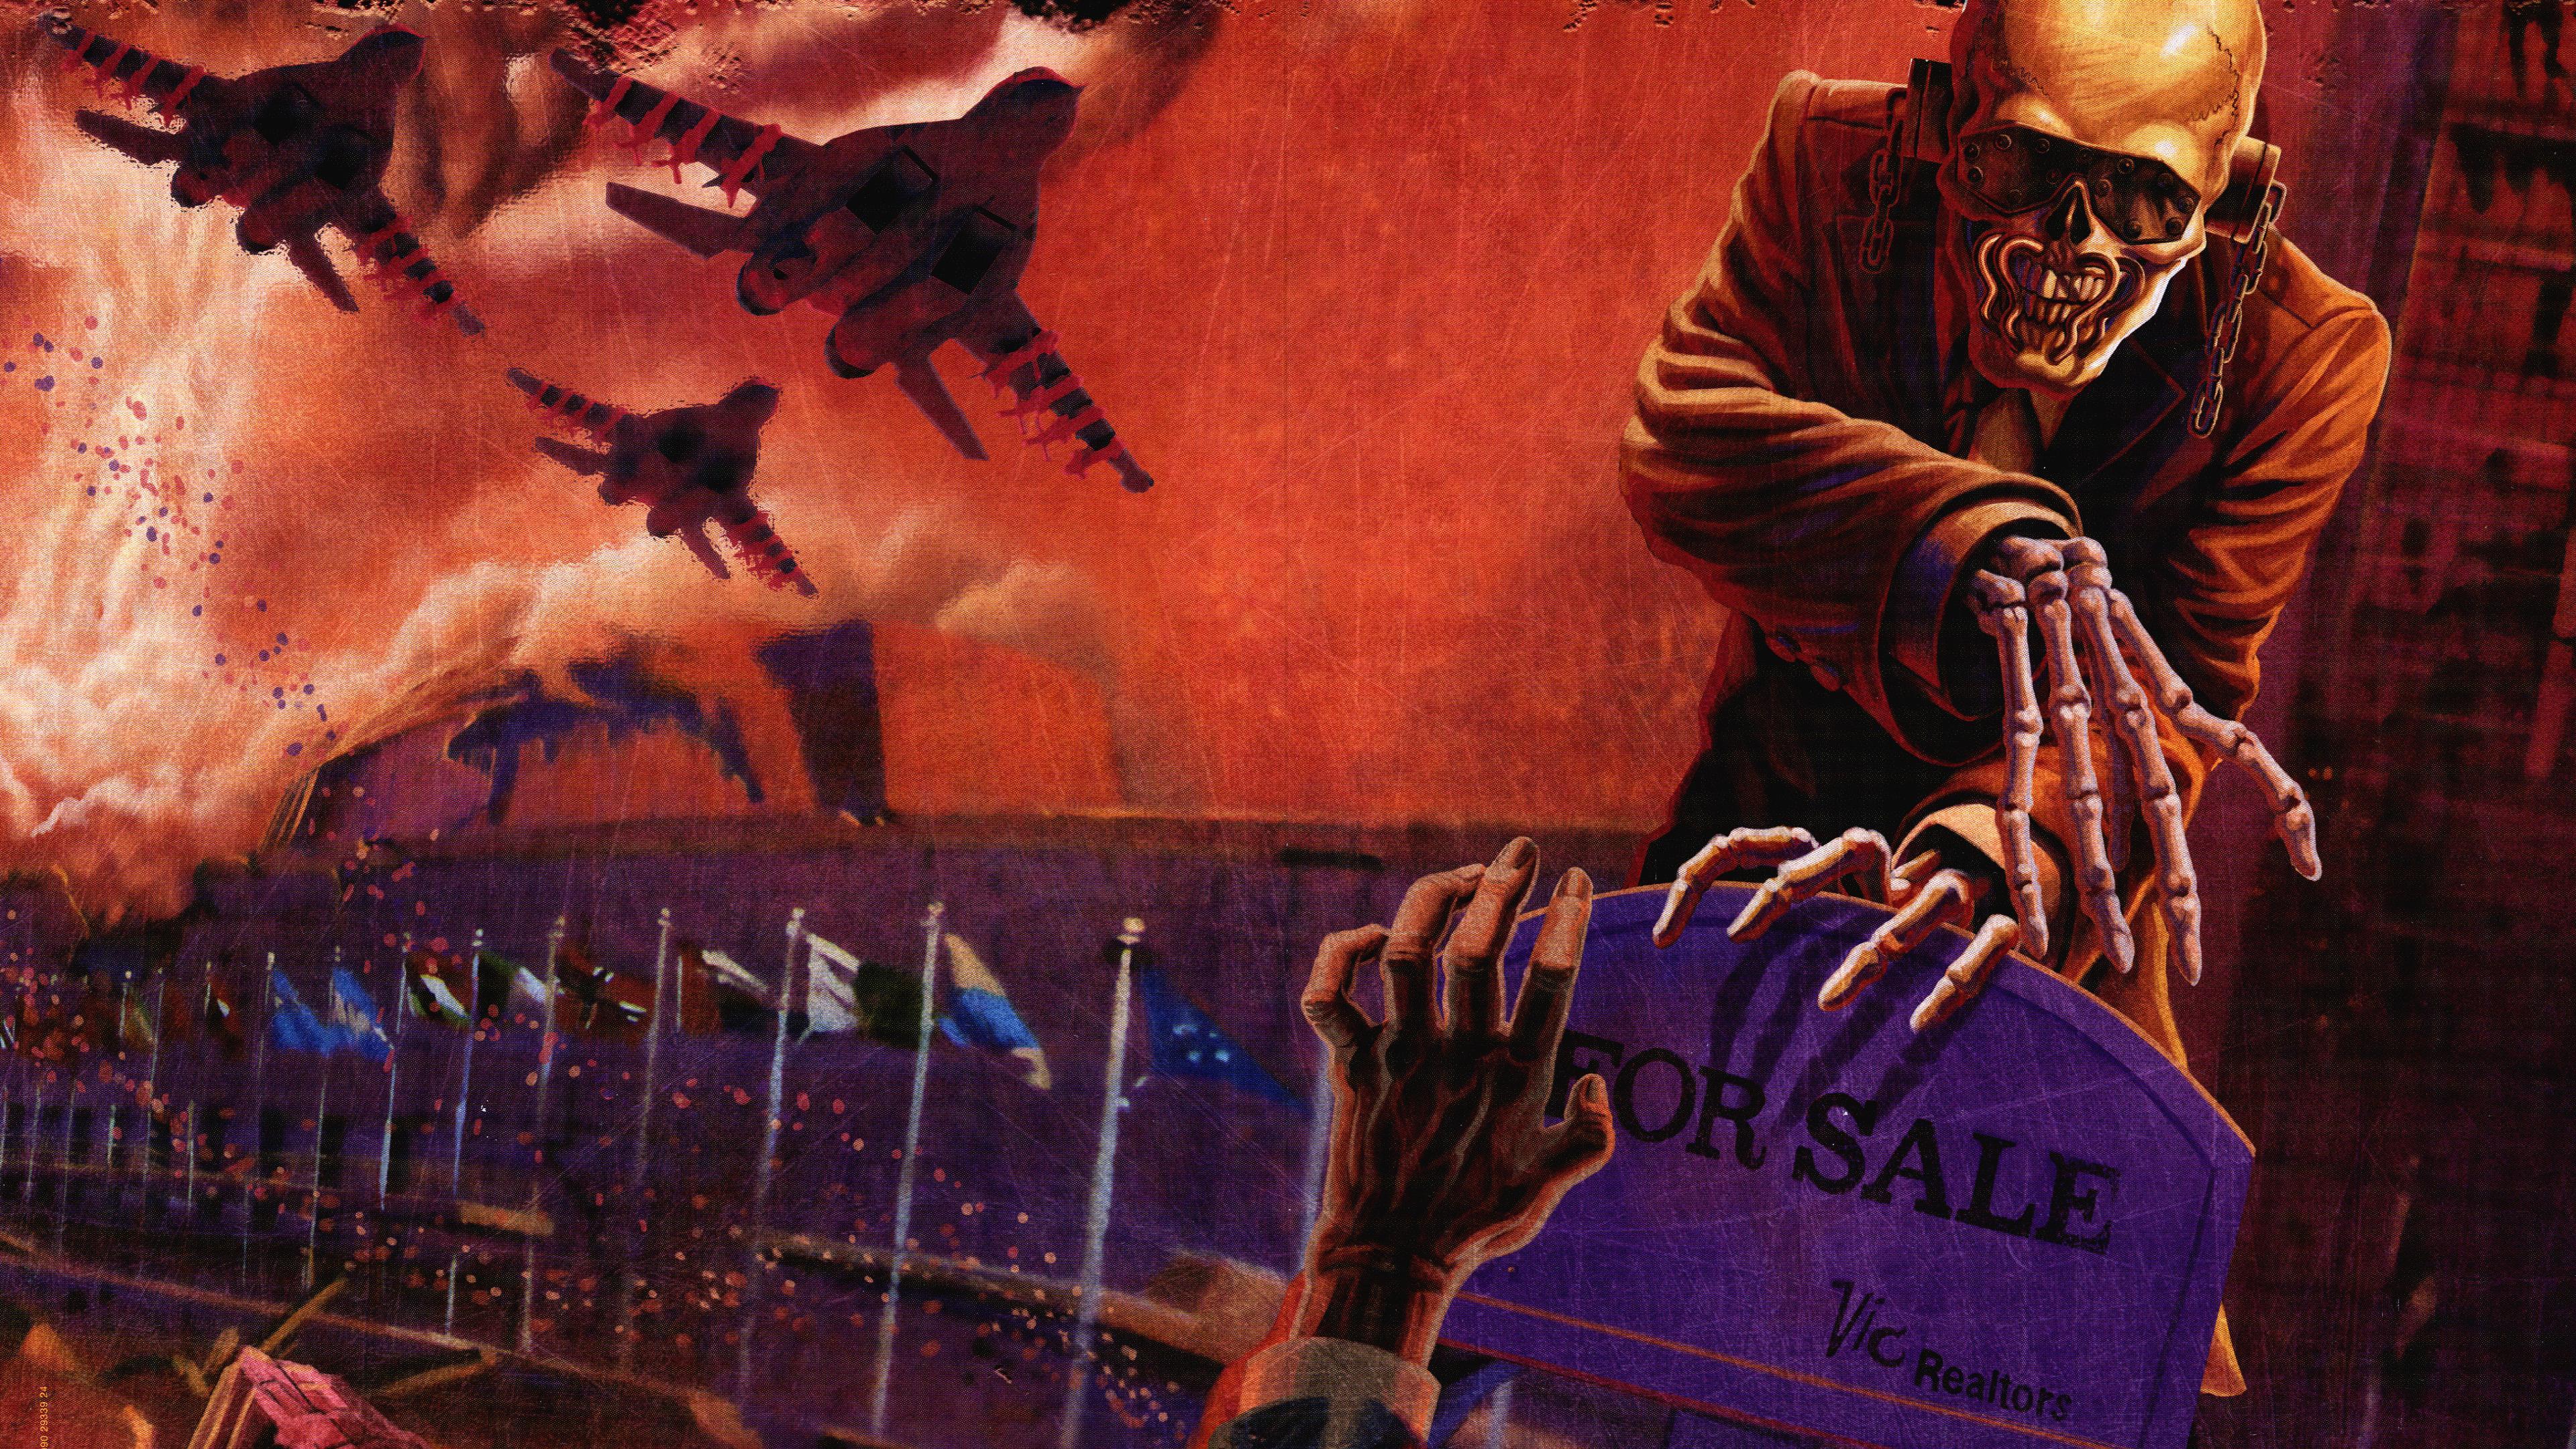 Megadeth Wallpapers Peace Sells